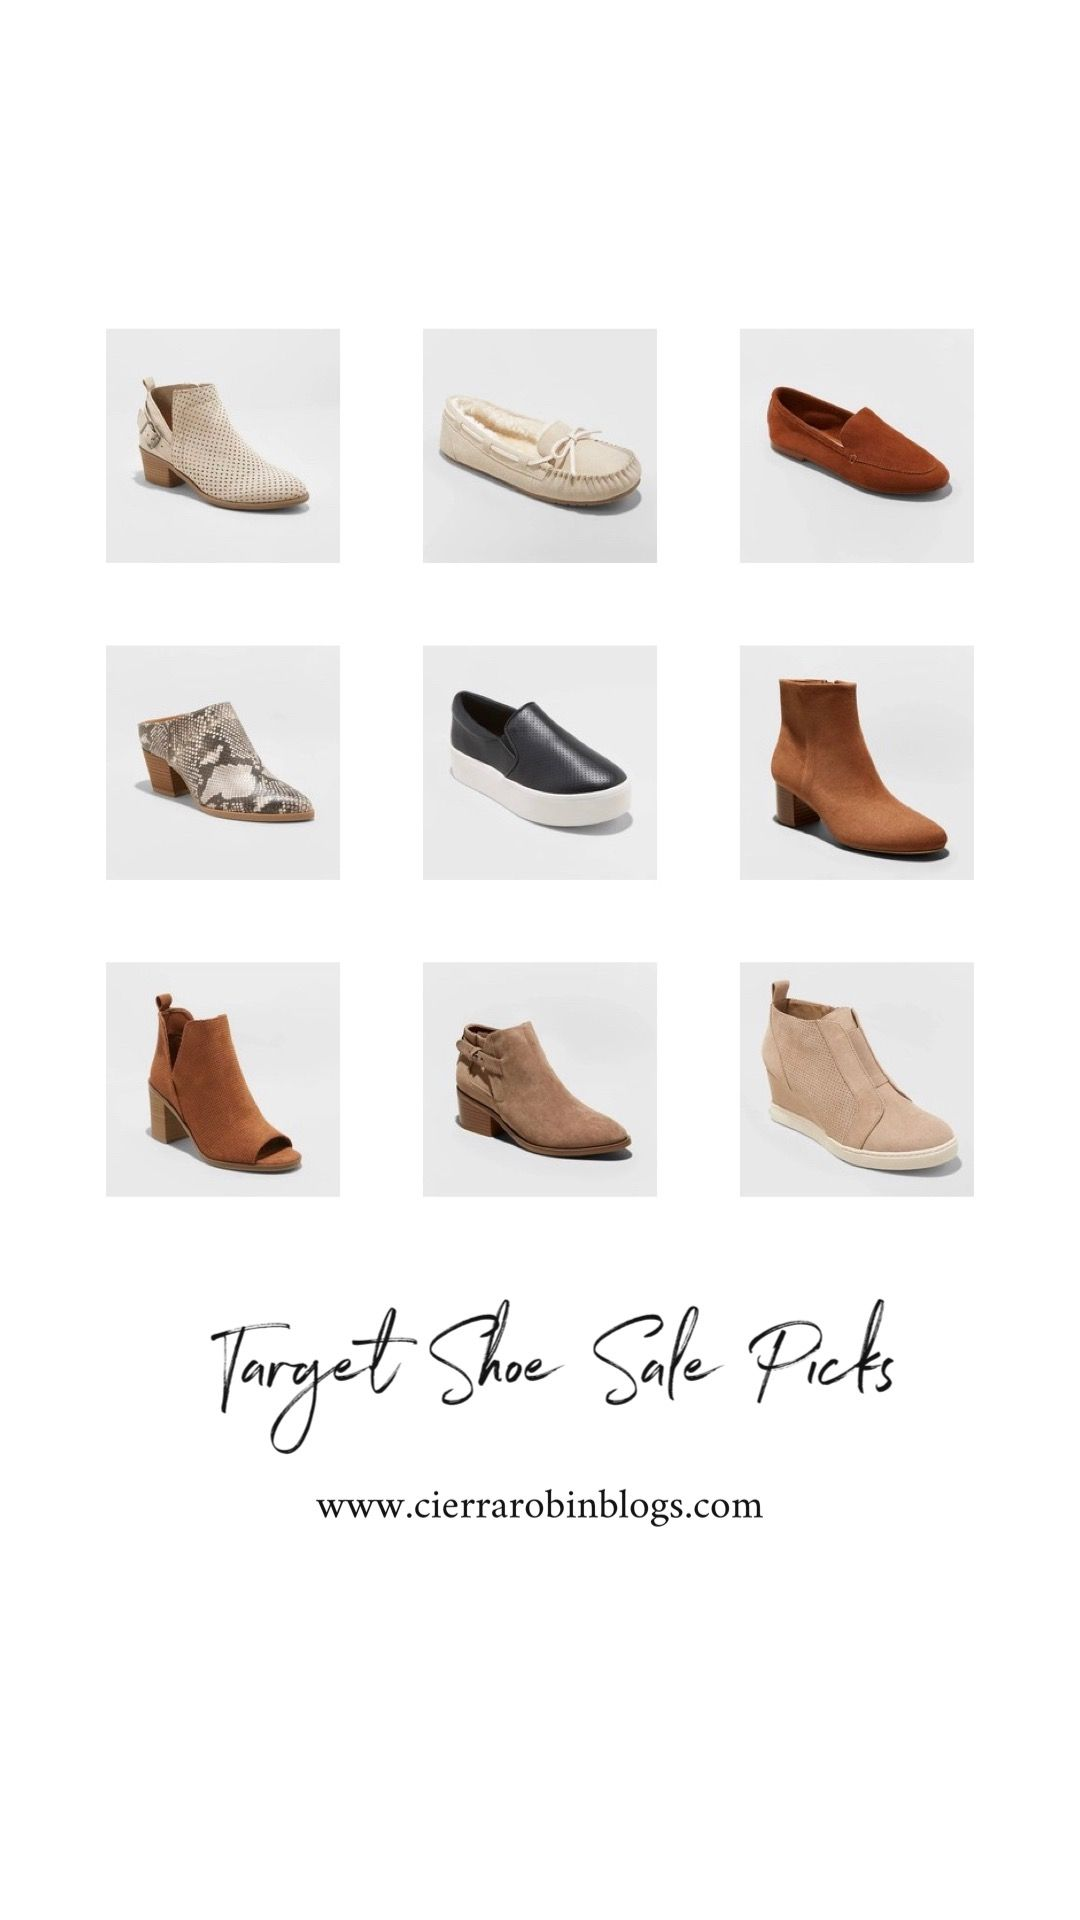 womens shoes, Womens shoes high heels